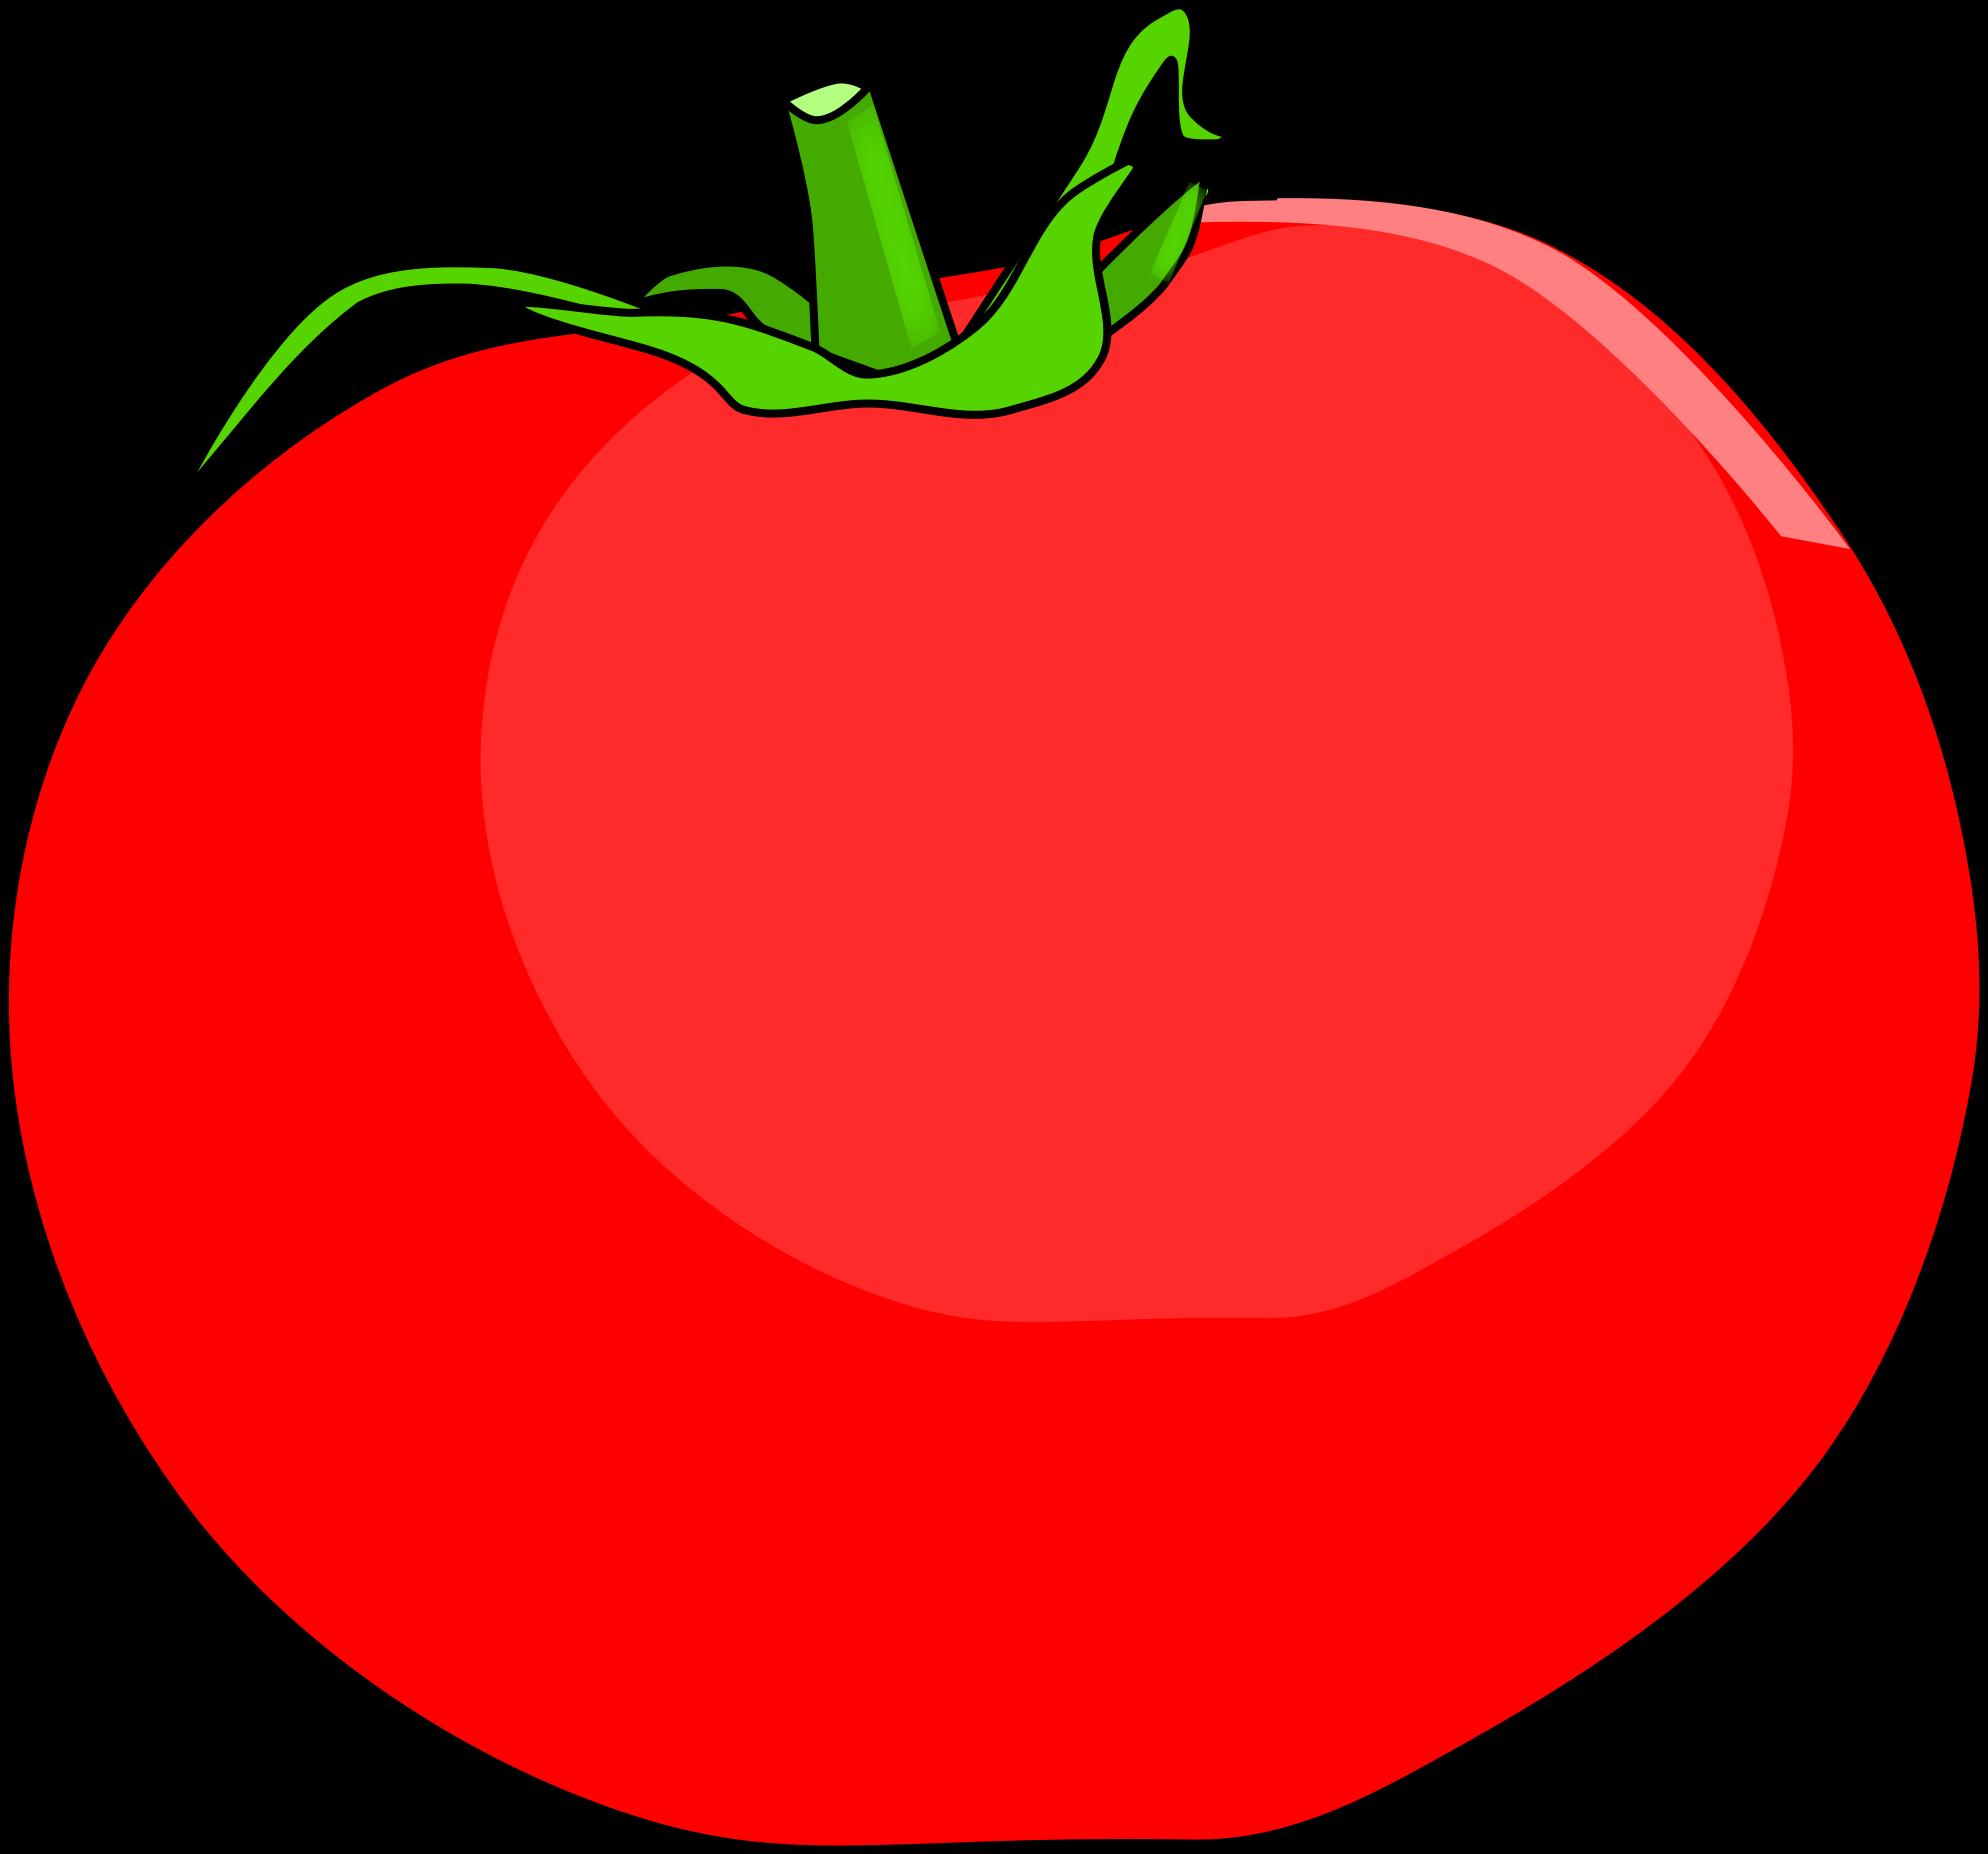 tomato clipart no backround #20